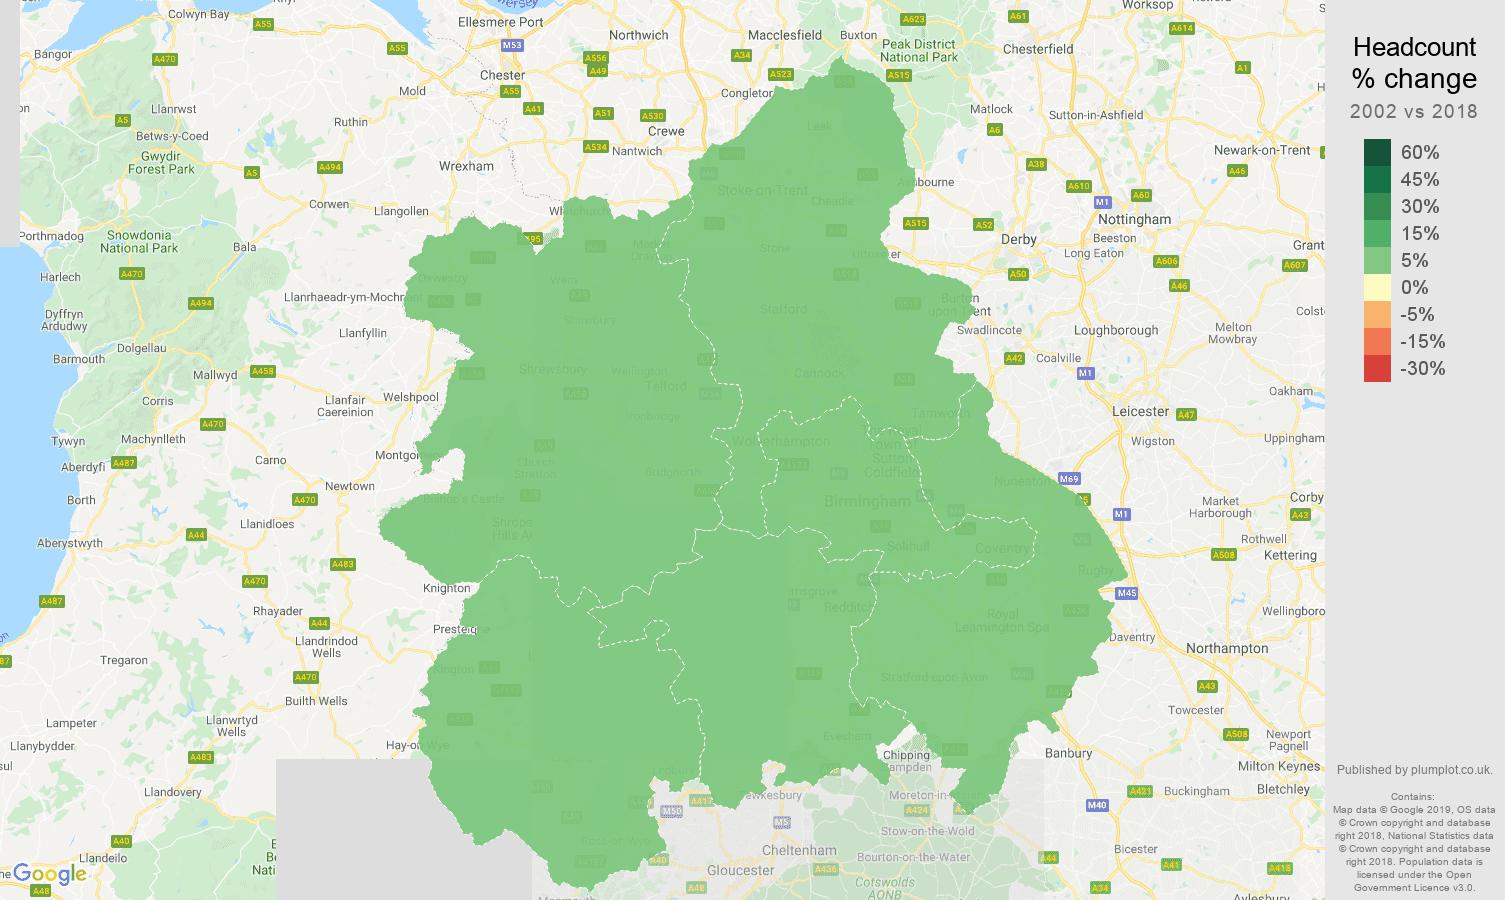 West Midlands headcount change map